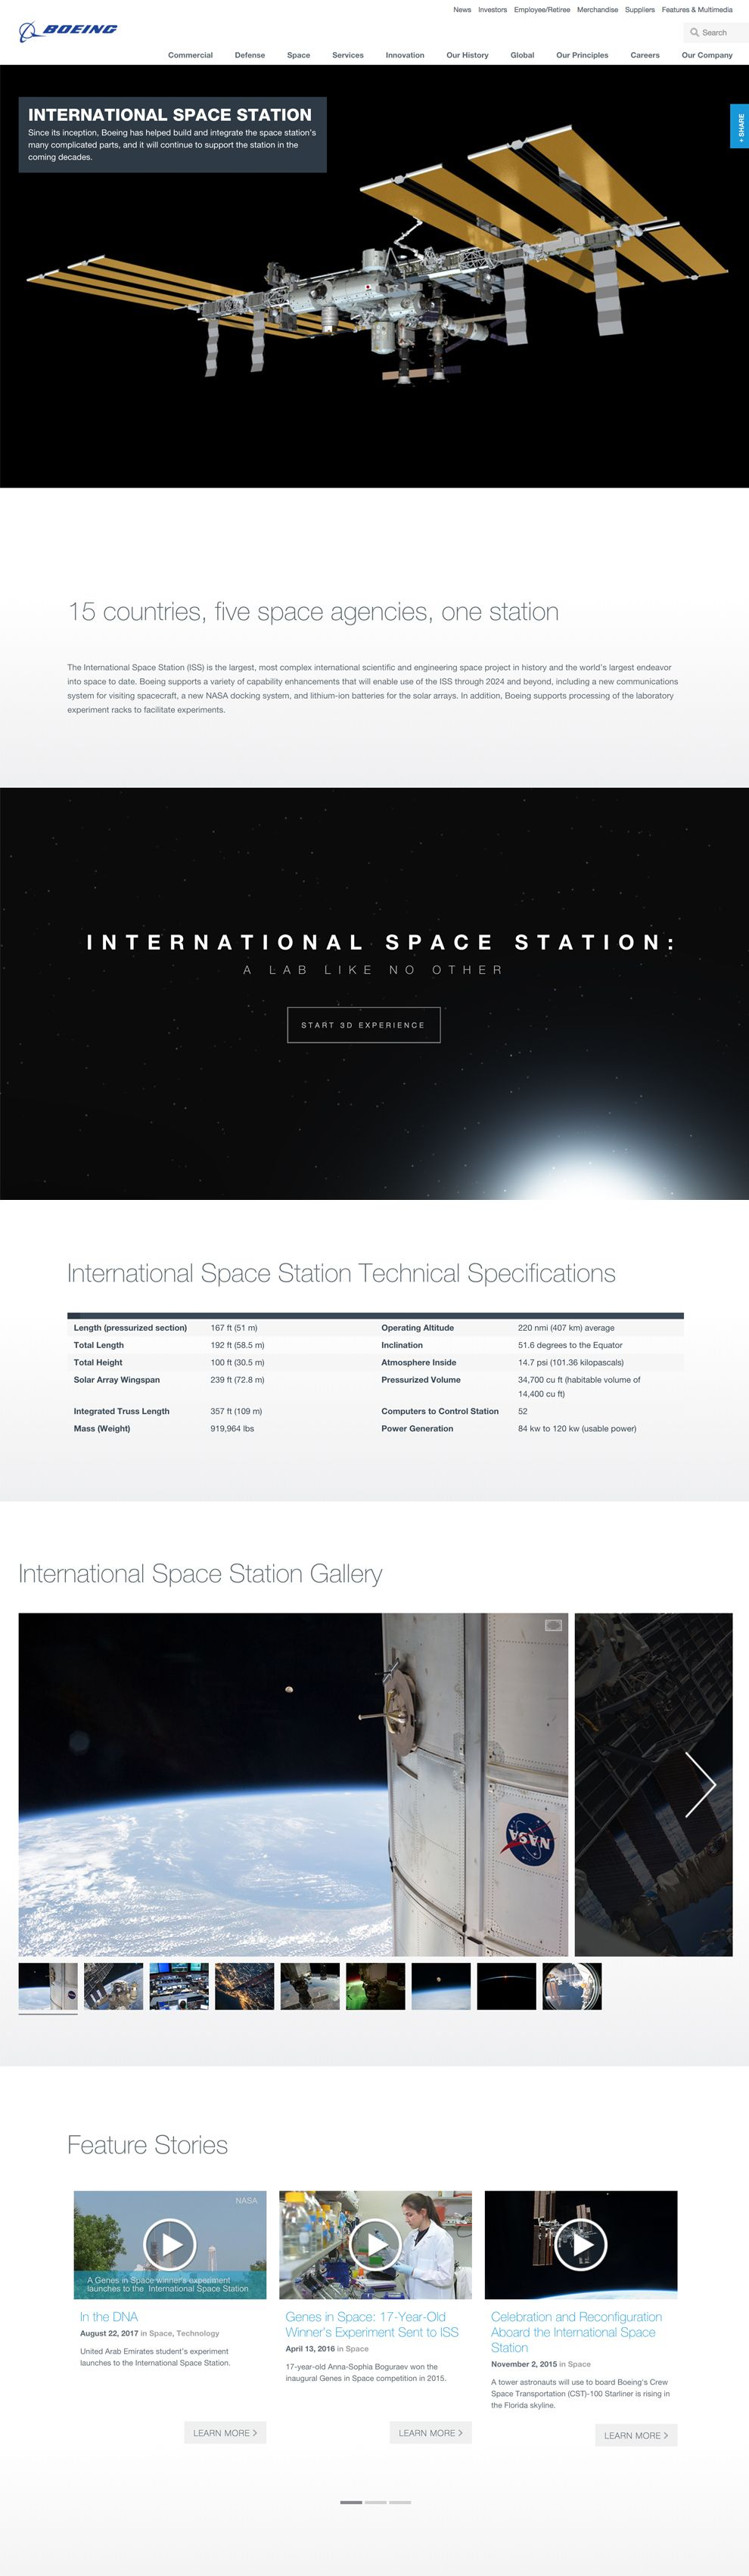 Boeing 3D International Space Station Website Design Homepage